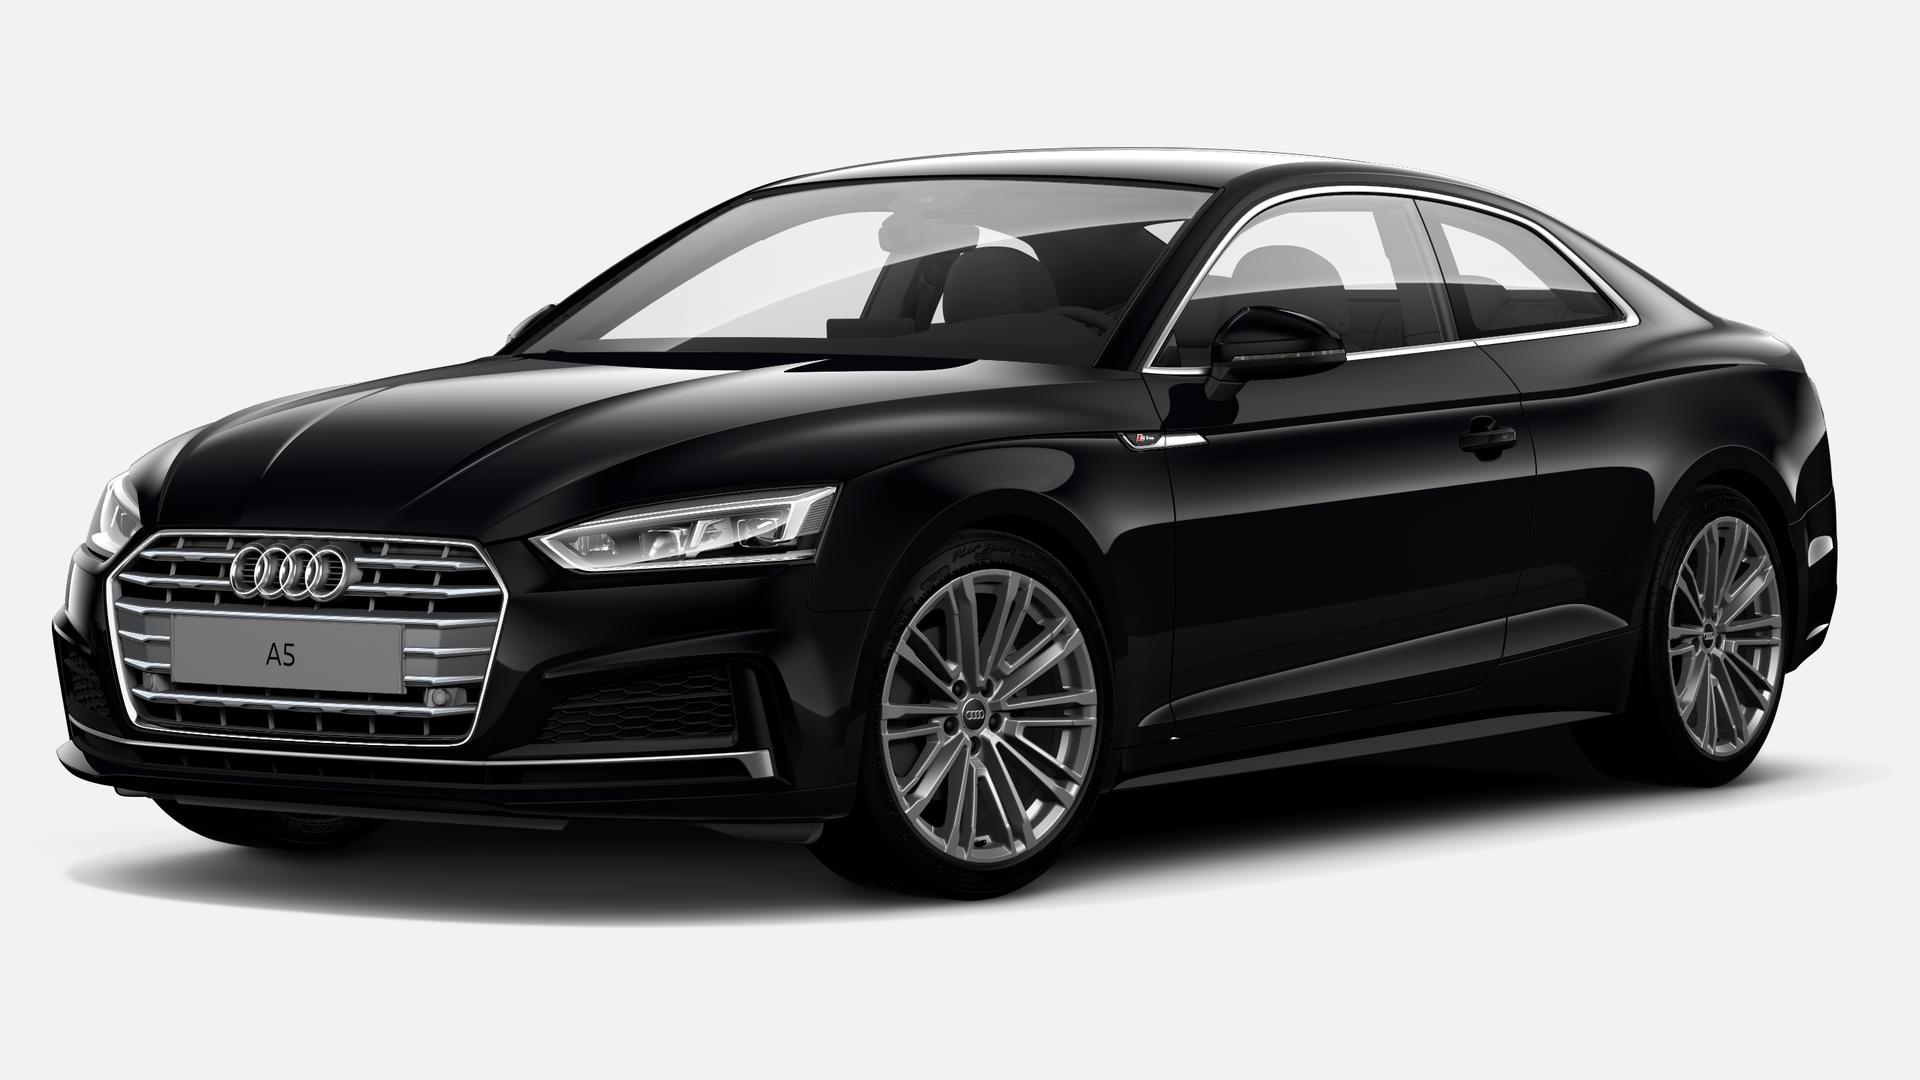 Foto 1 Audi A5 Coupe 35 TDI S line S-Tronic 110 kW (150 CV)